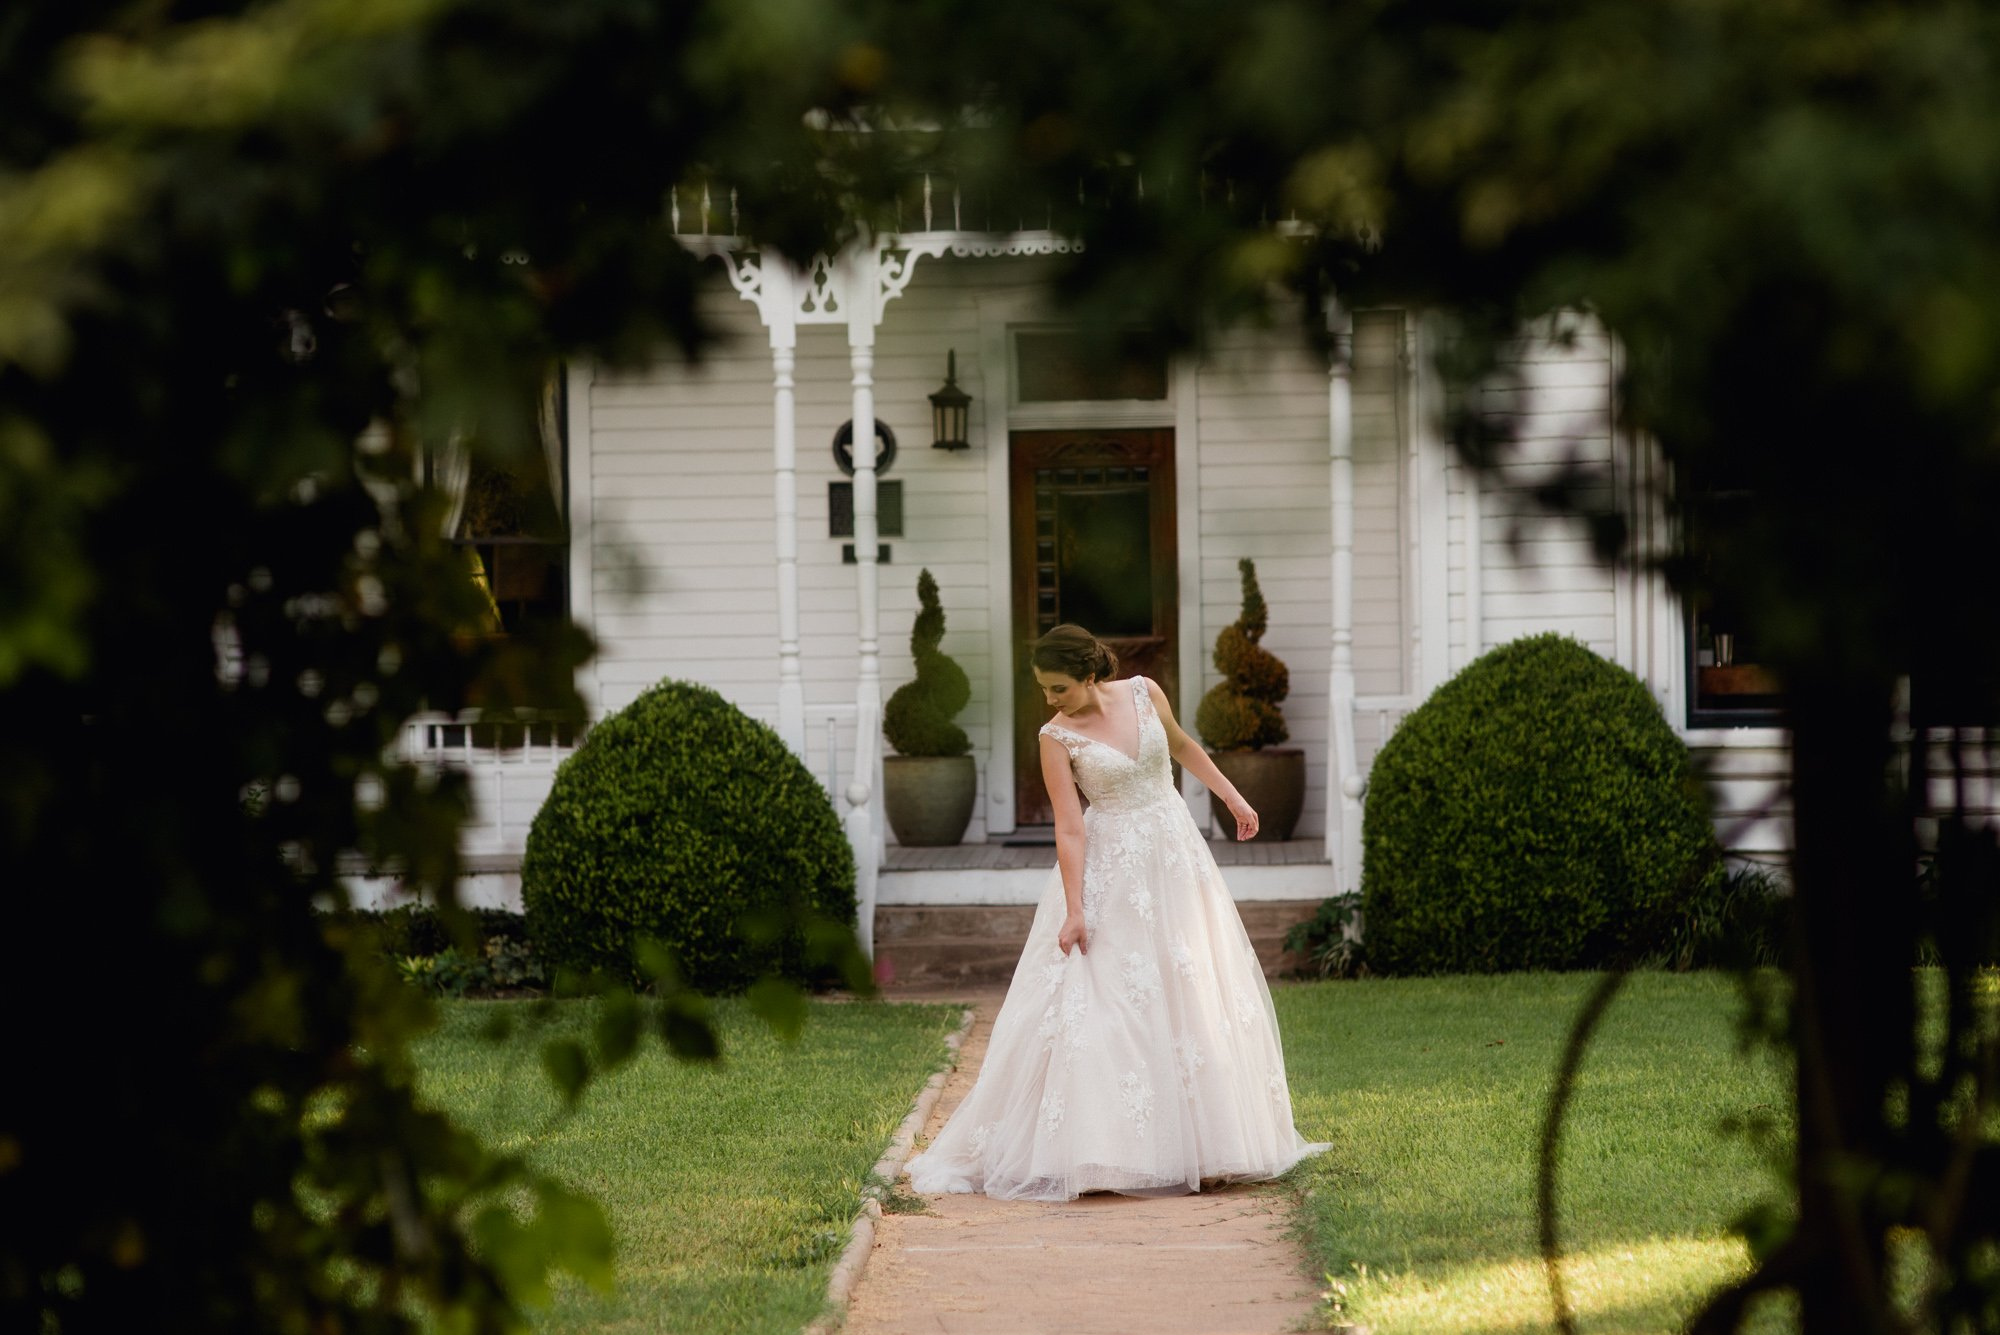 barr mansion bridal session, summer bridal portraits at the barr mansion